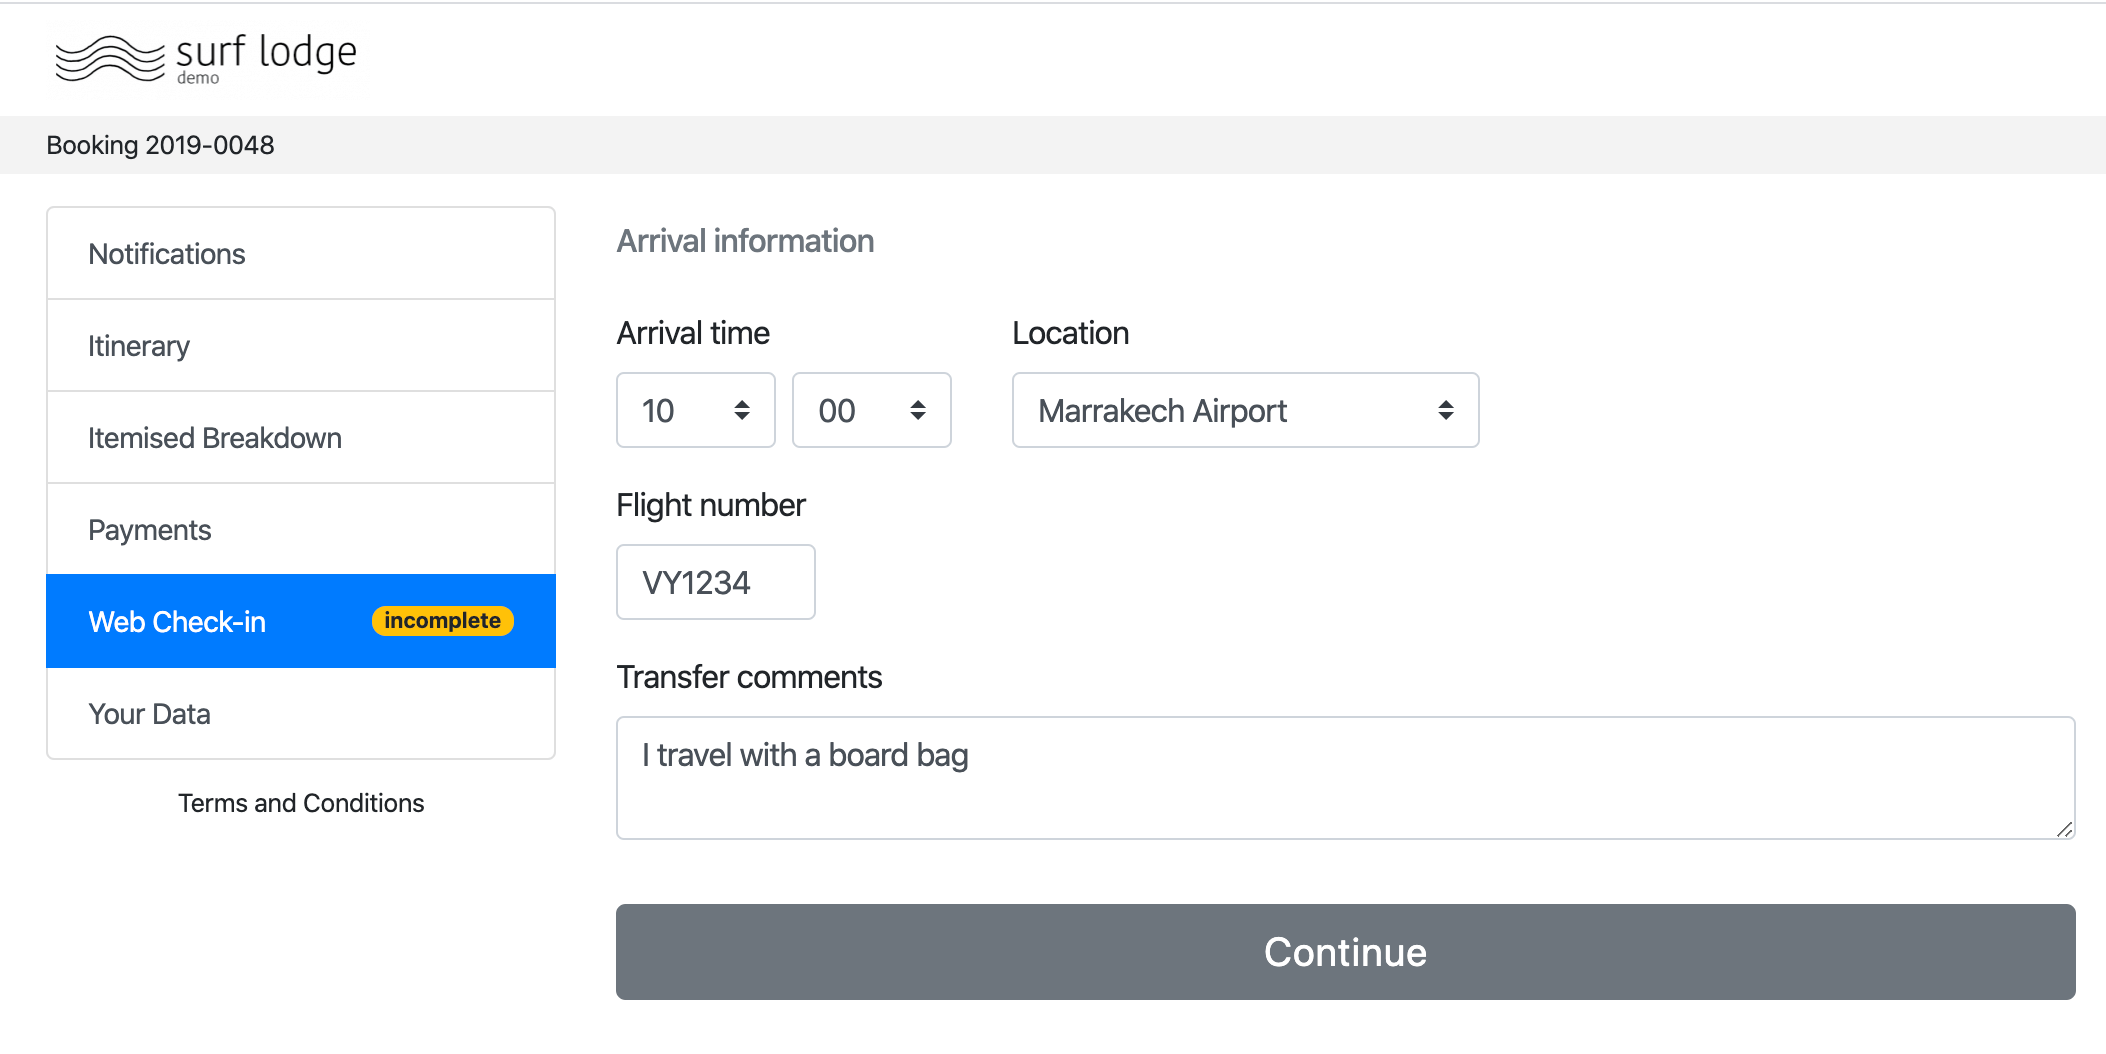 Capturing arrival information via the Customer Portal